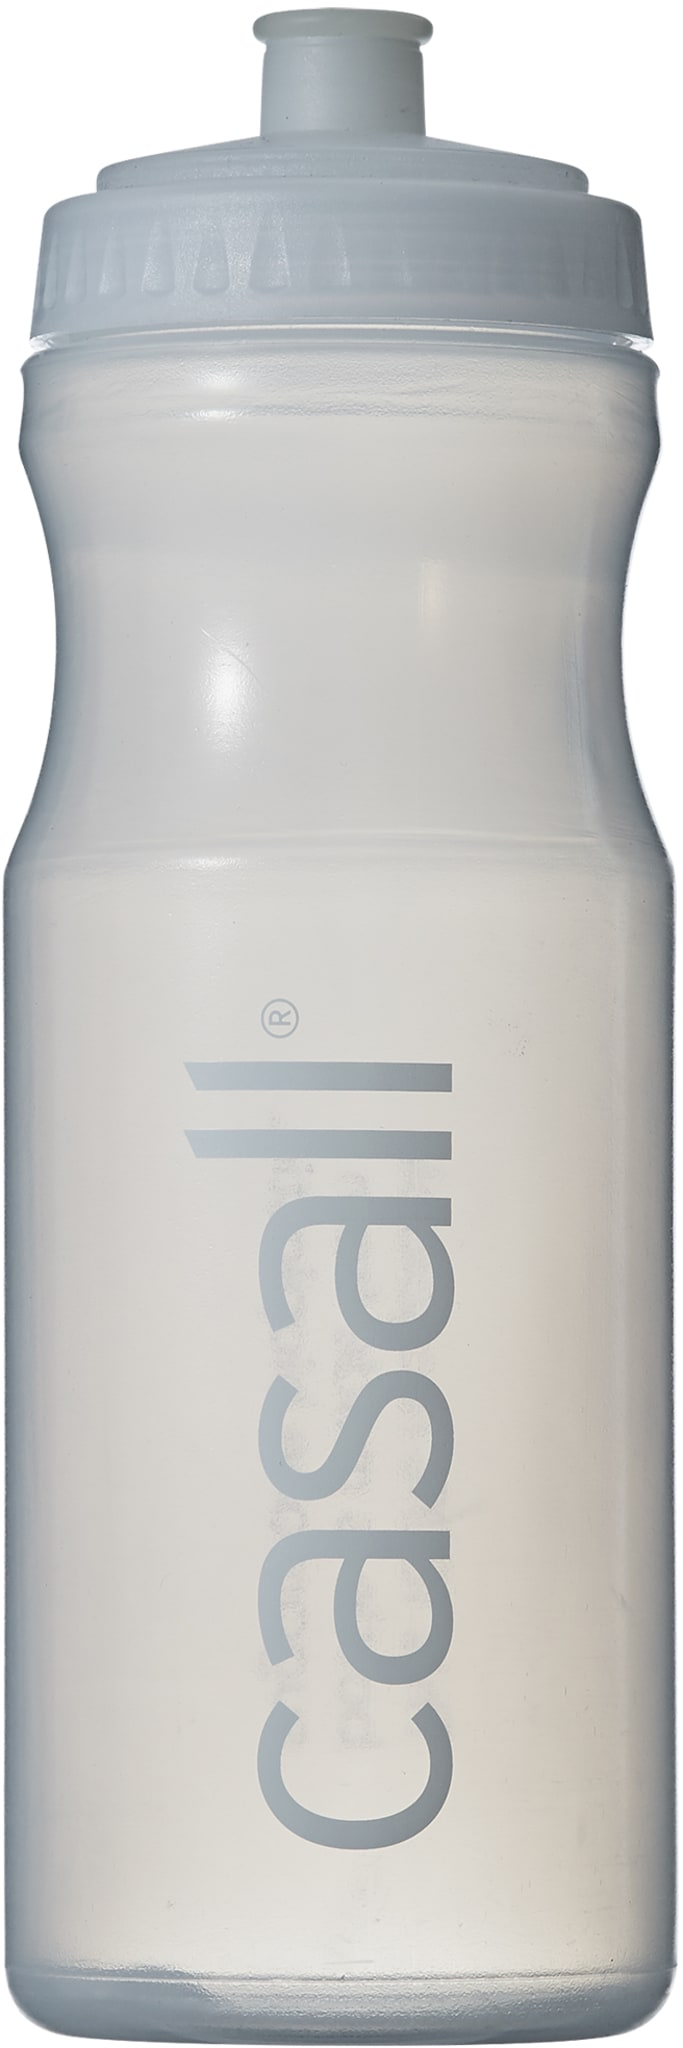 ECO Fitness Bottle 0.7L